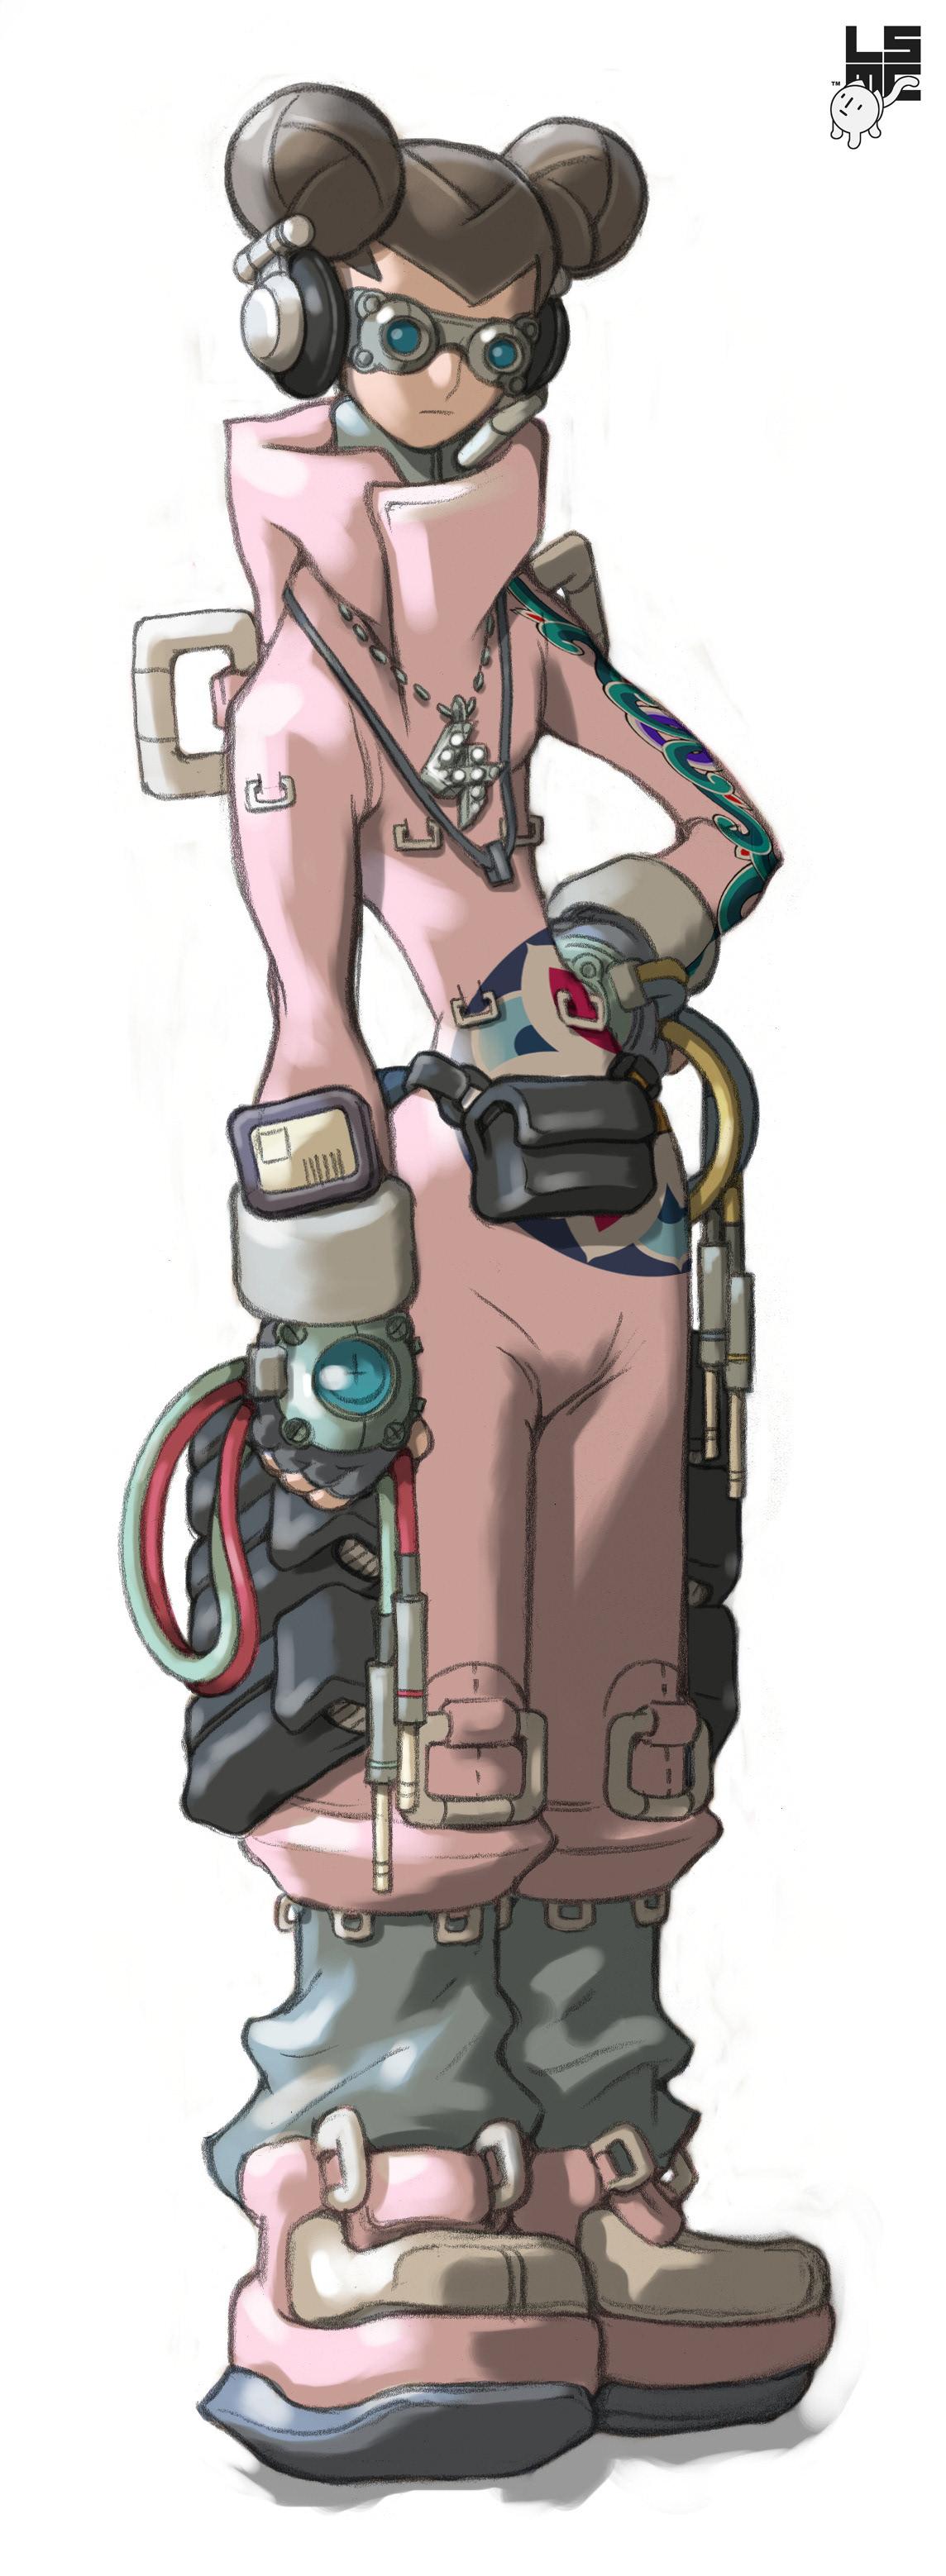 animation  Korea 2D Animation action artwork Character design  concept design future SF songoku